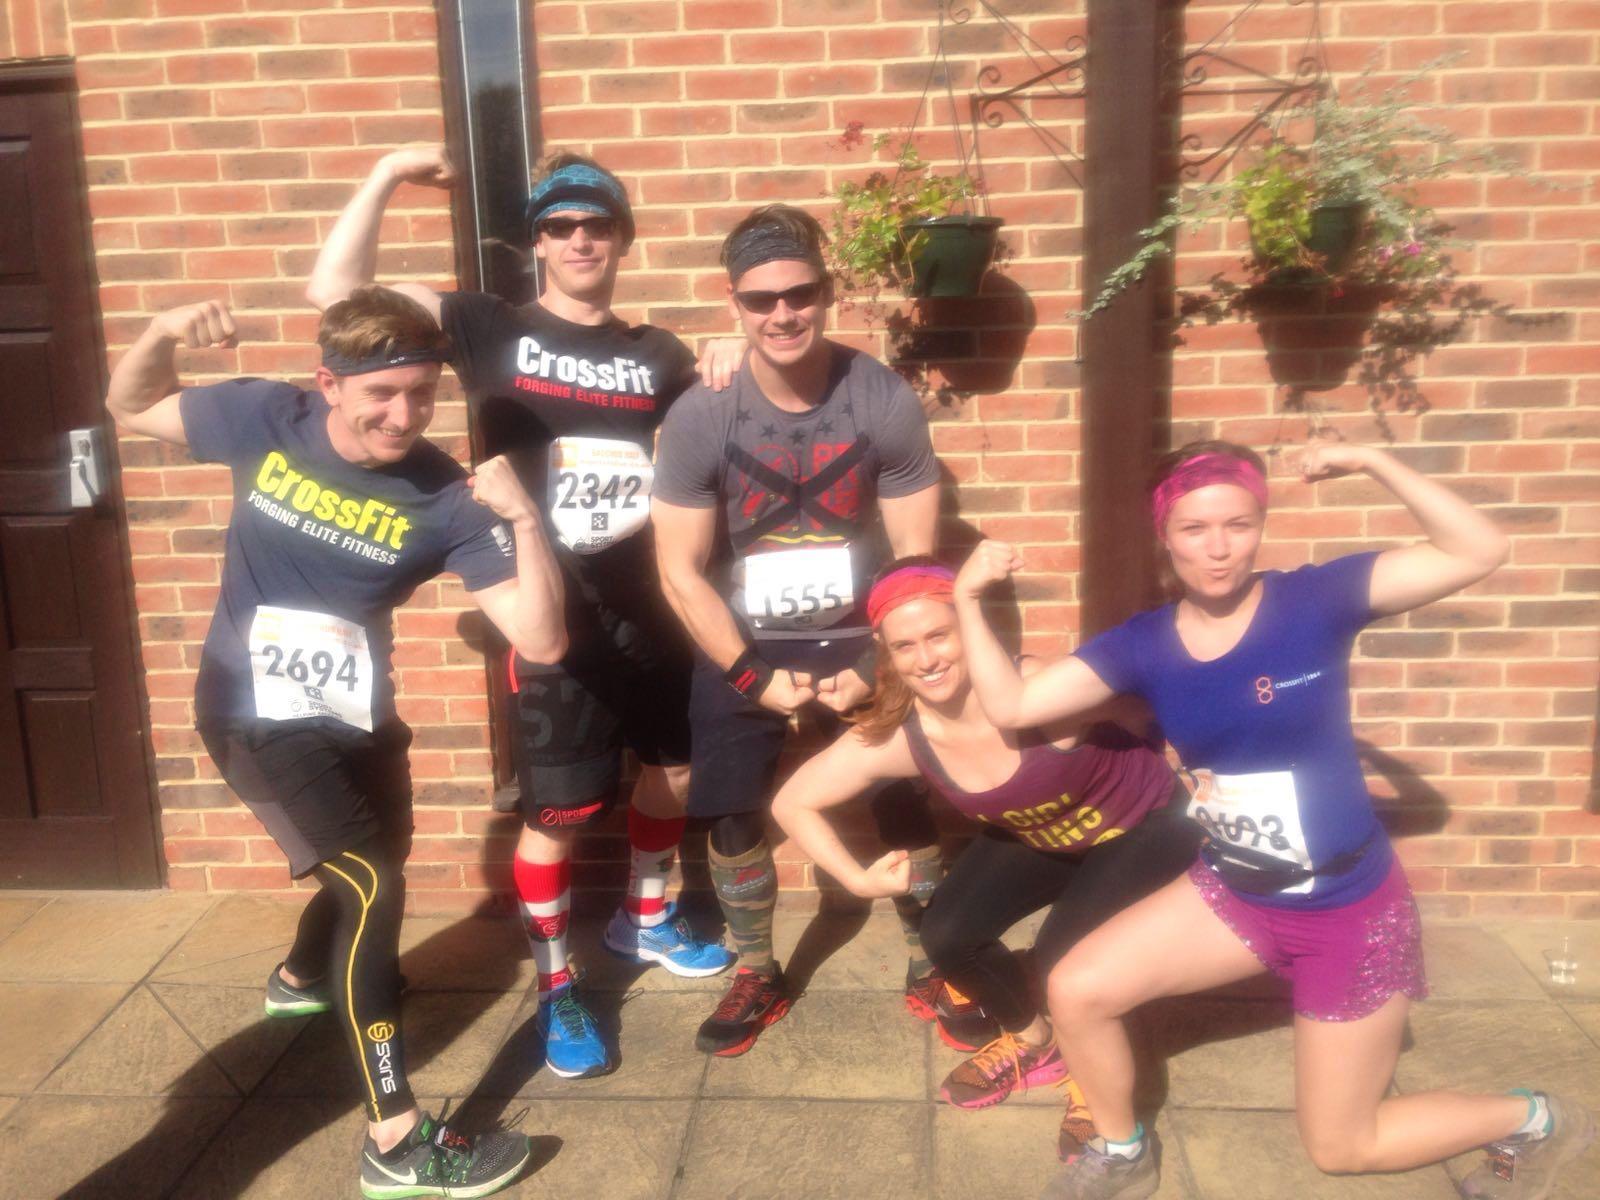 The CrossFit 1864 Crew living the Chalk Dream at the Bacchus Half Marathon